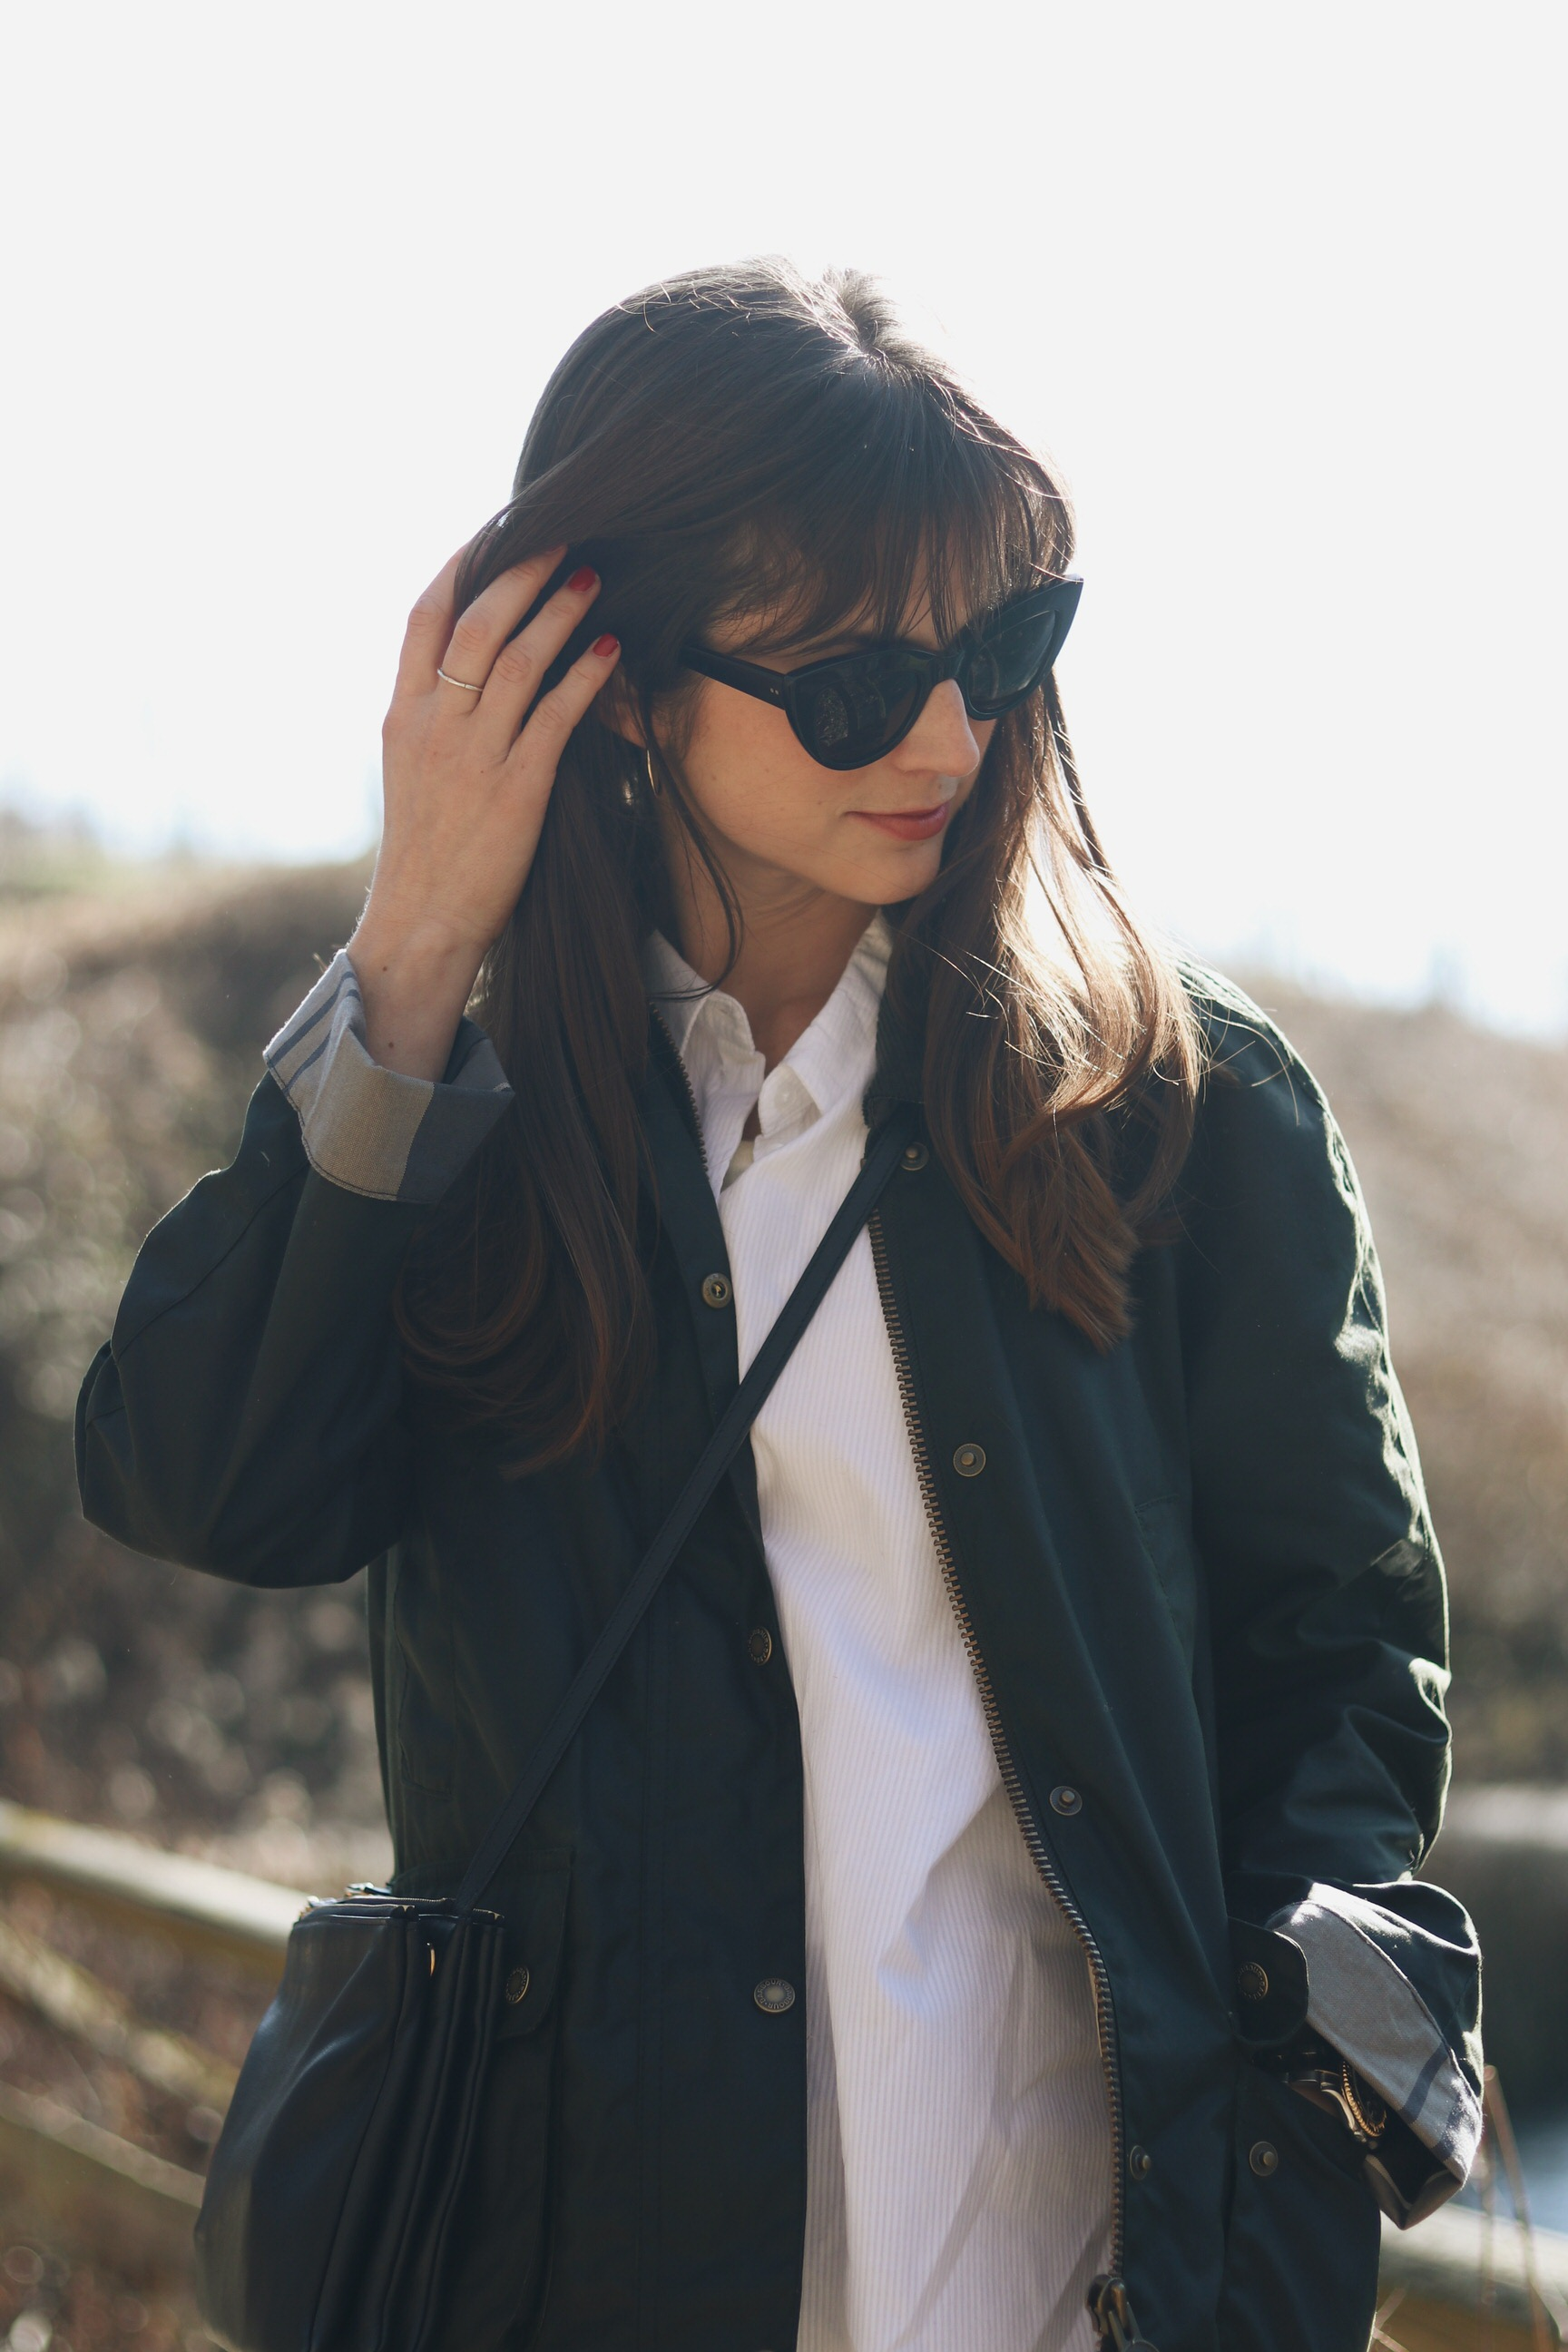 Barbour Jacket Jacke Celine trio Bag schwarz Outfit Wander Look